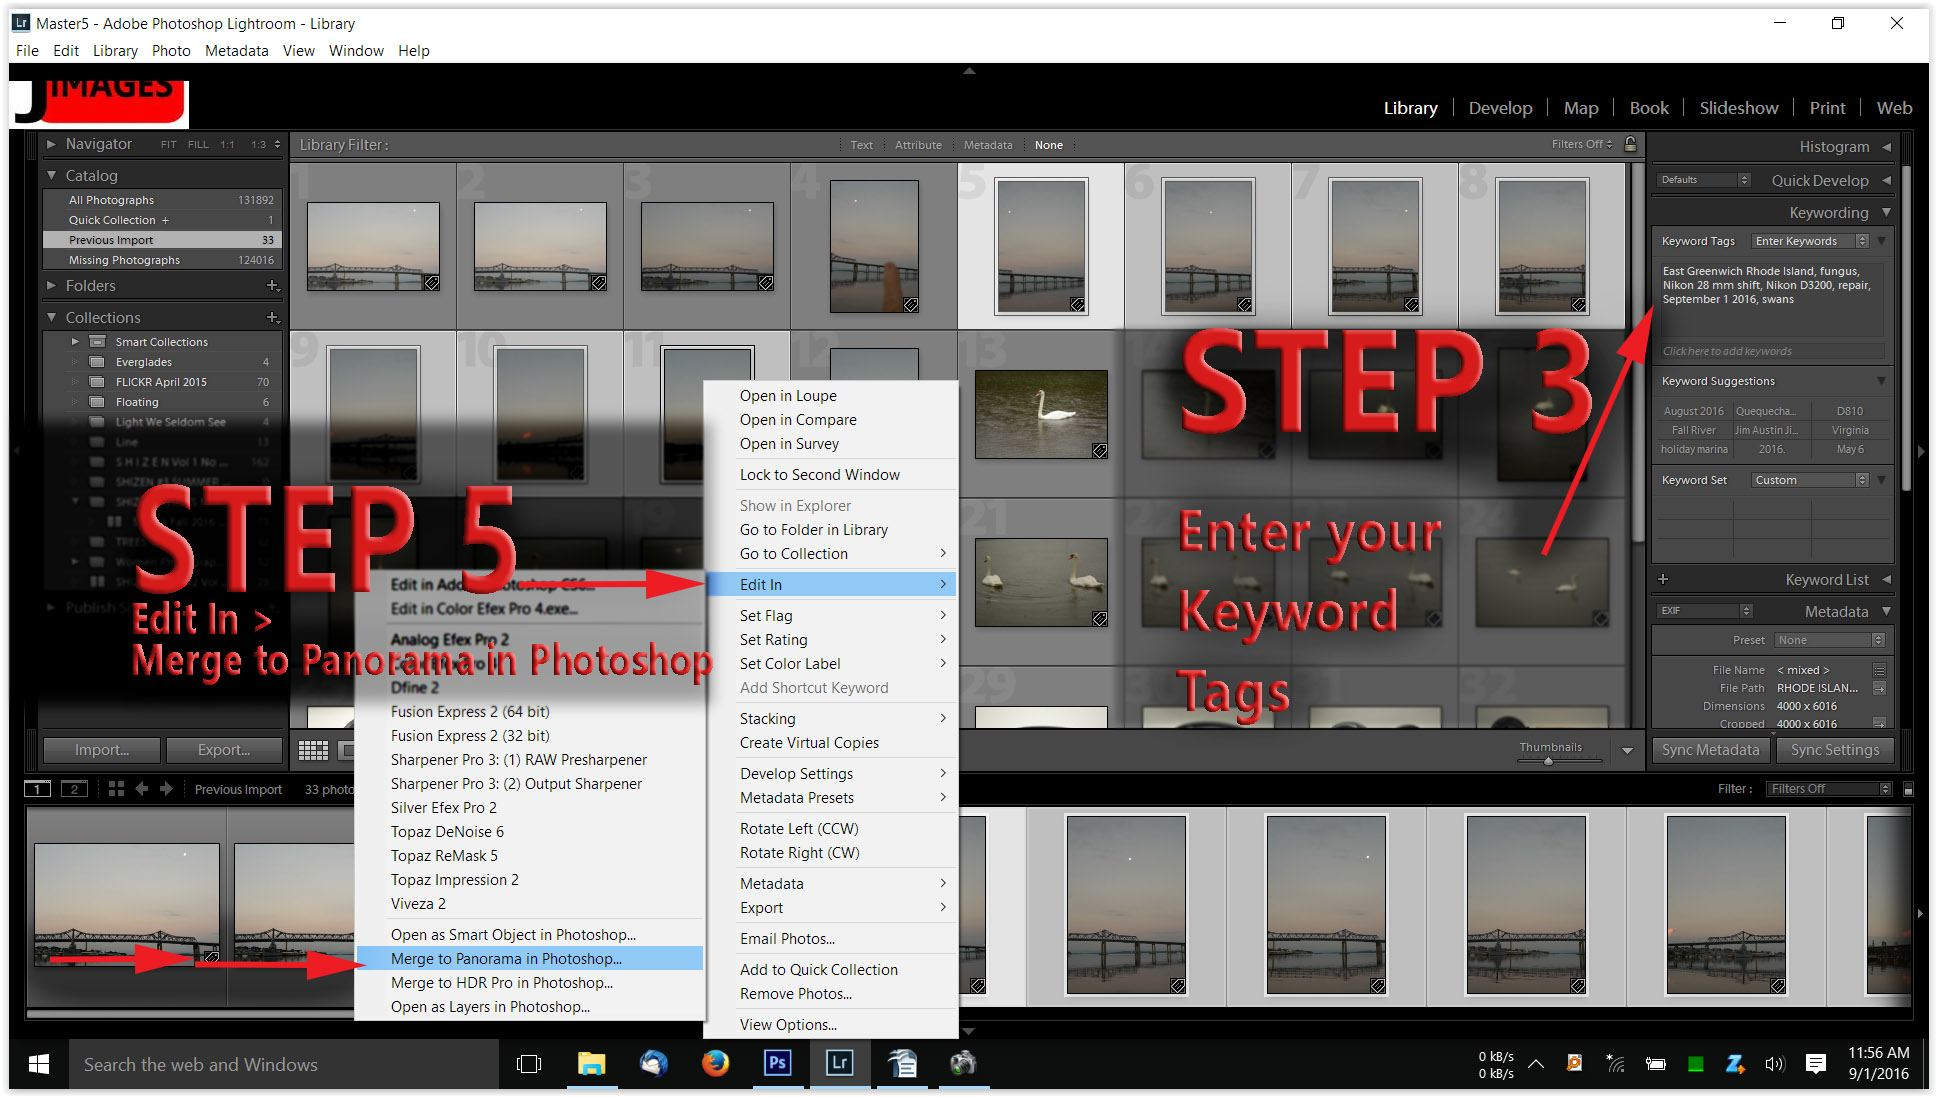 step-3-step-5-panos-lightroom-photoshop-jim-austin-2016